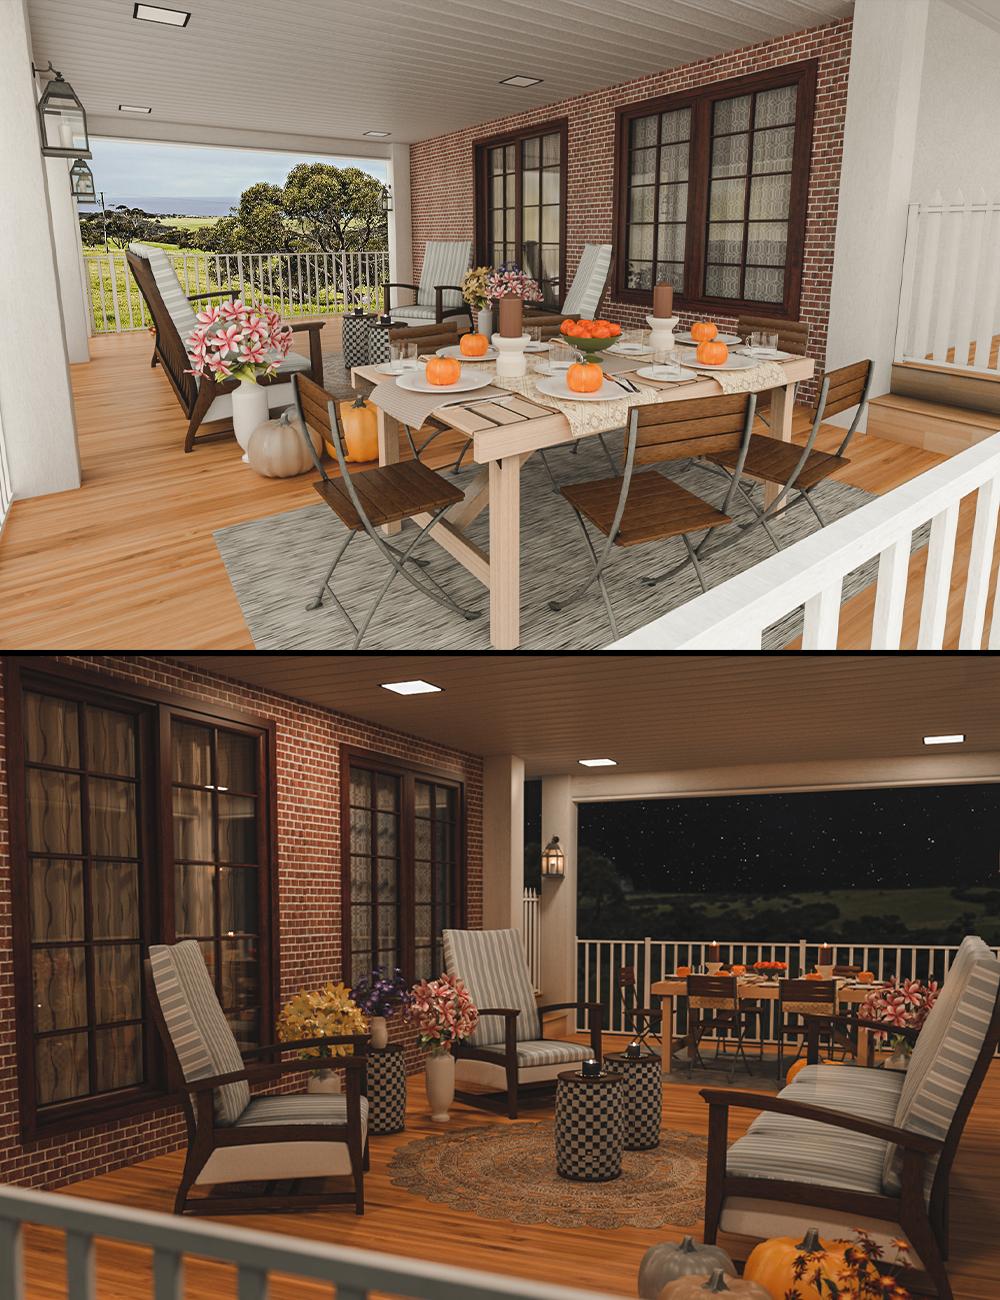 Cozy Porch by: clacydarch3d, 3D Models by Daz 3D